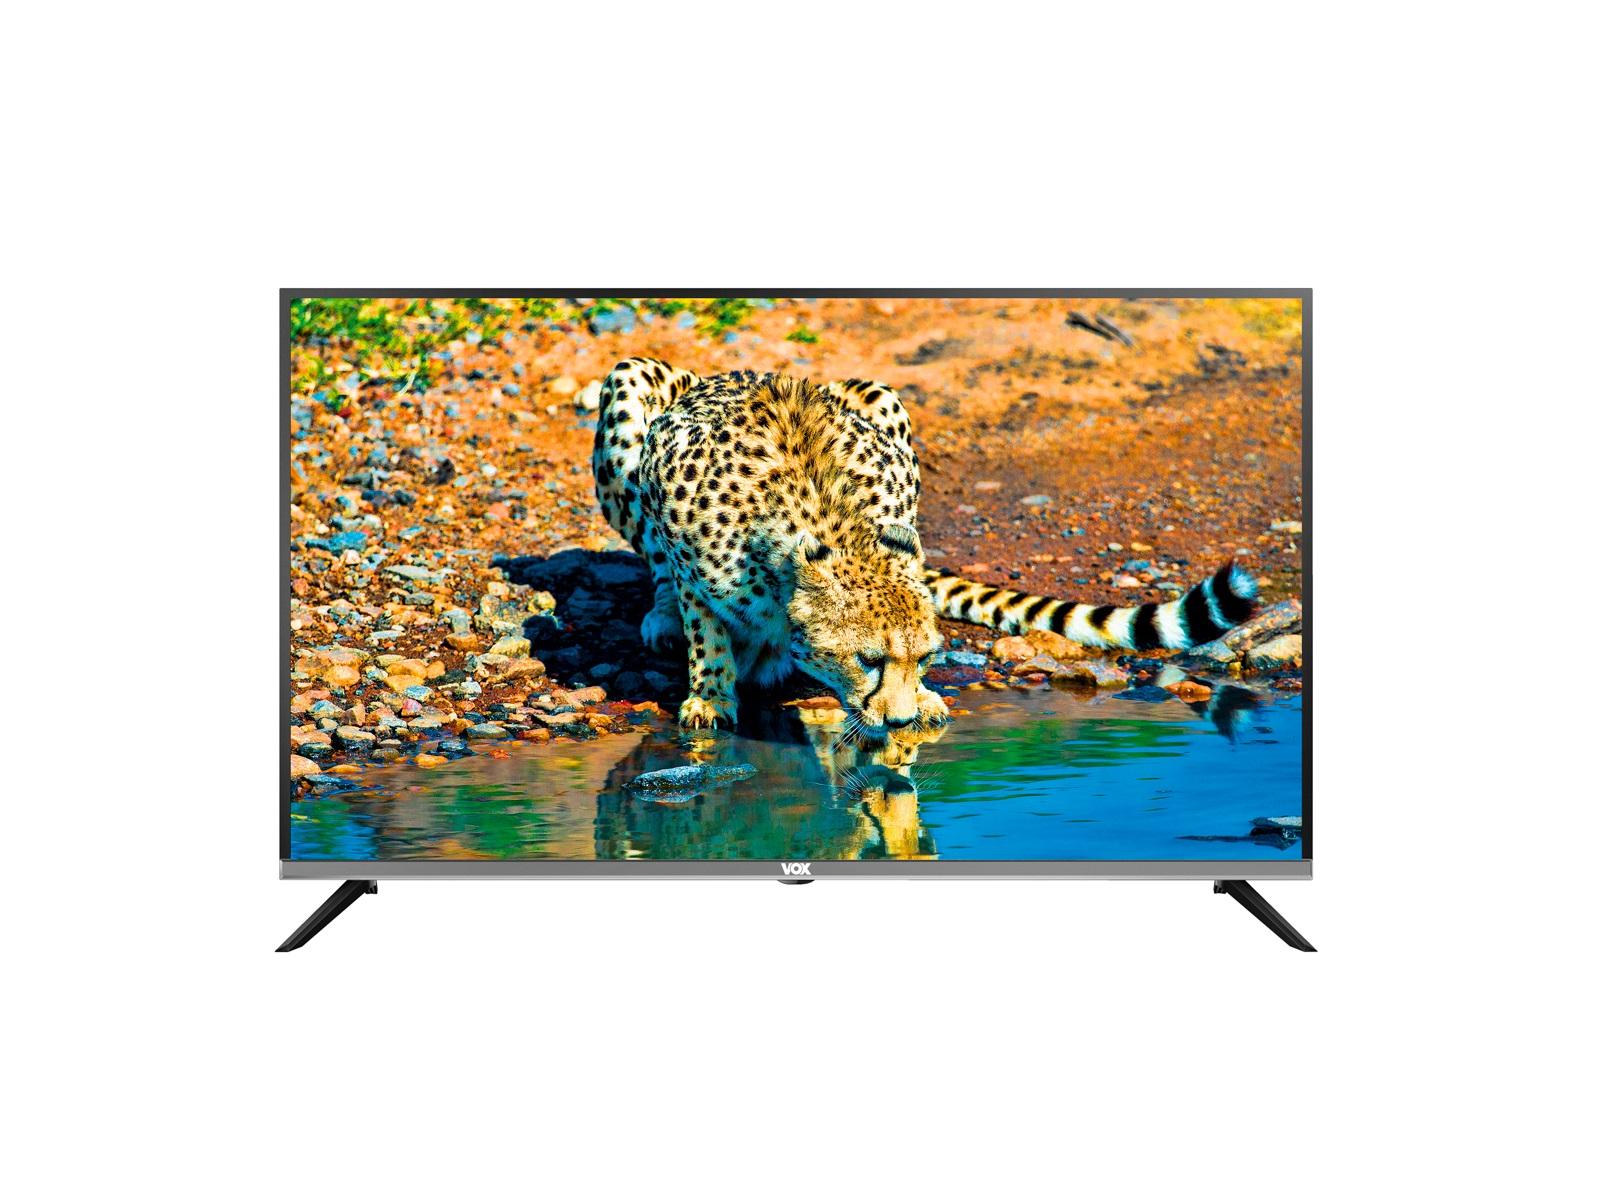 Vox Smart Led TV 40ADS553B